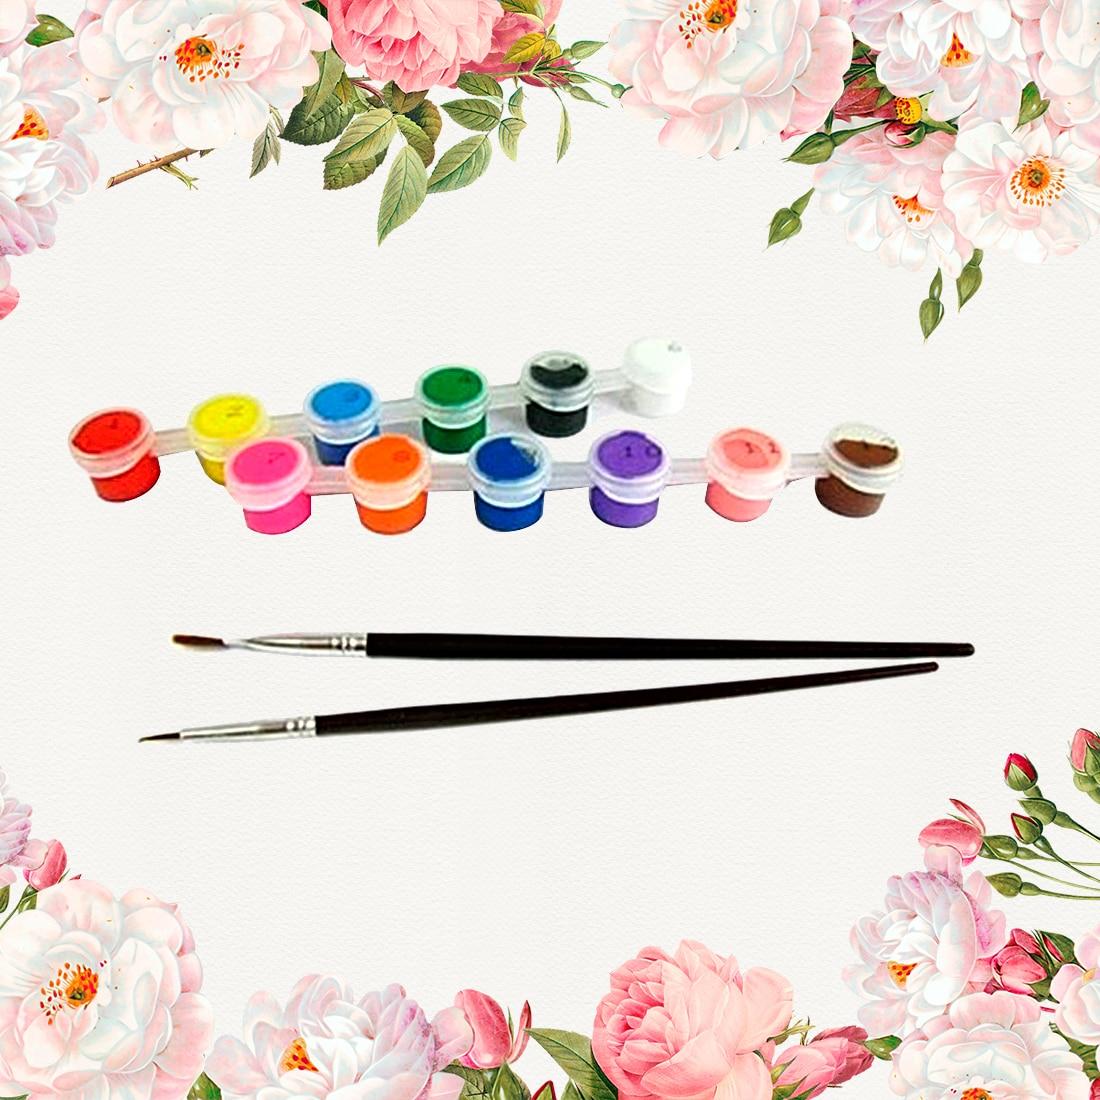 FangNymph 12 Colors With 2 Paint Blue Brushes Per Set Acrylic Paints For Oil Painting Nail Art Clothes Art Digital Random Color